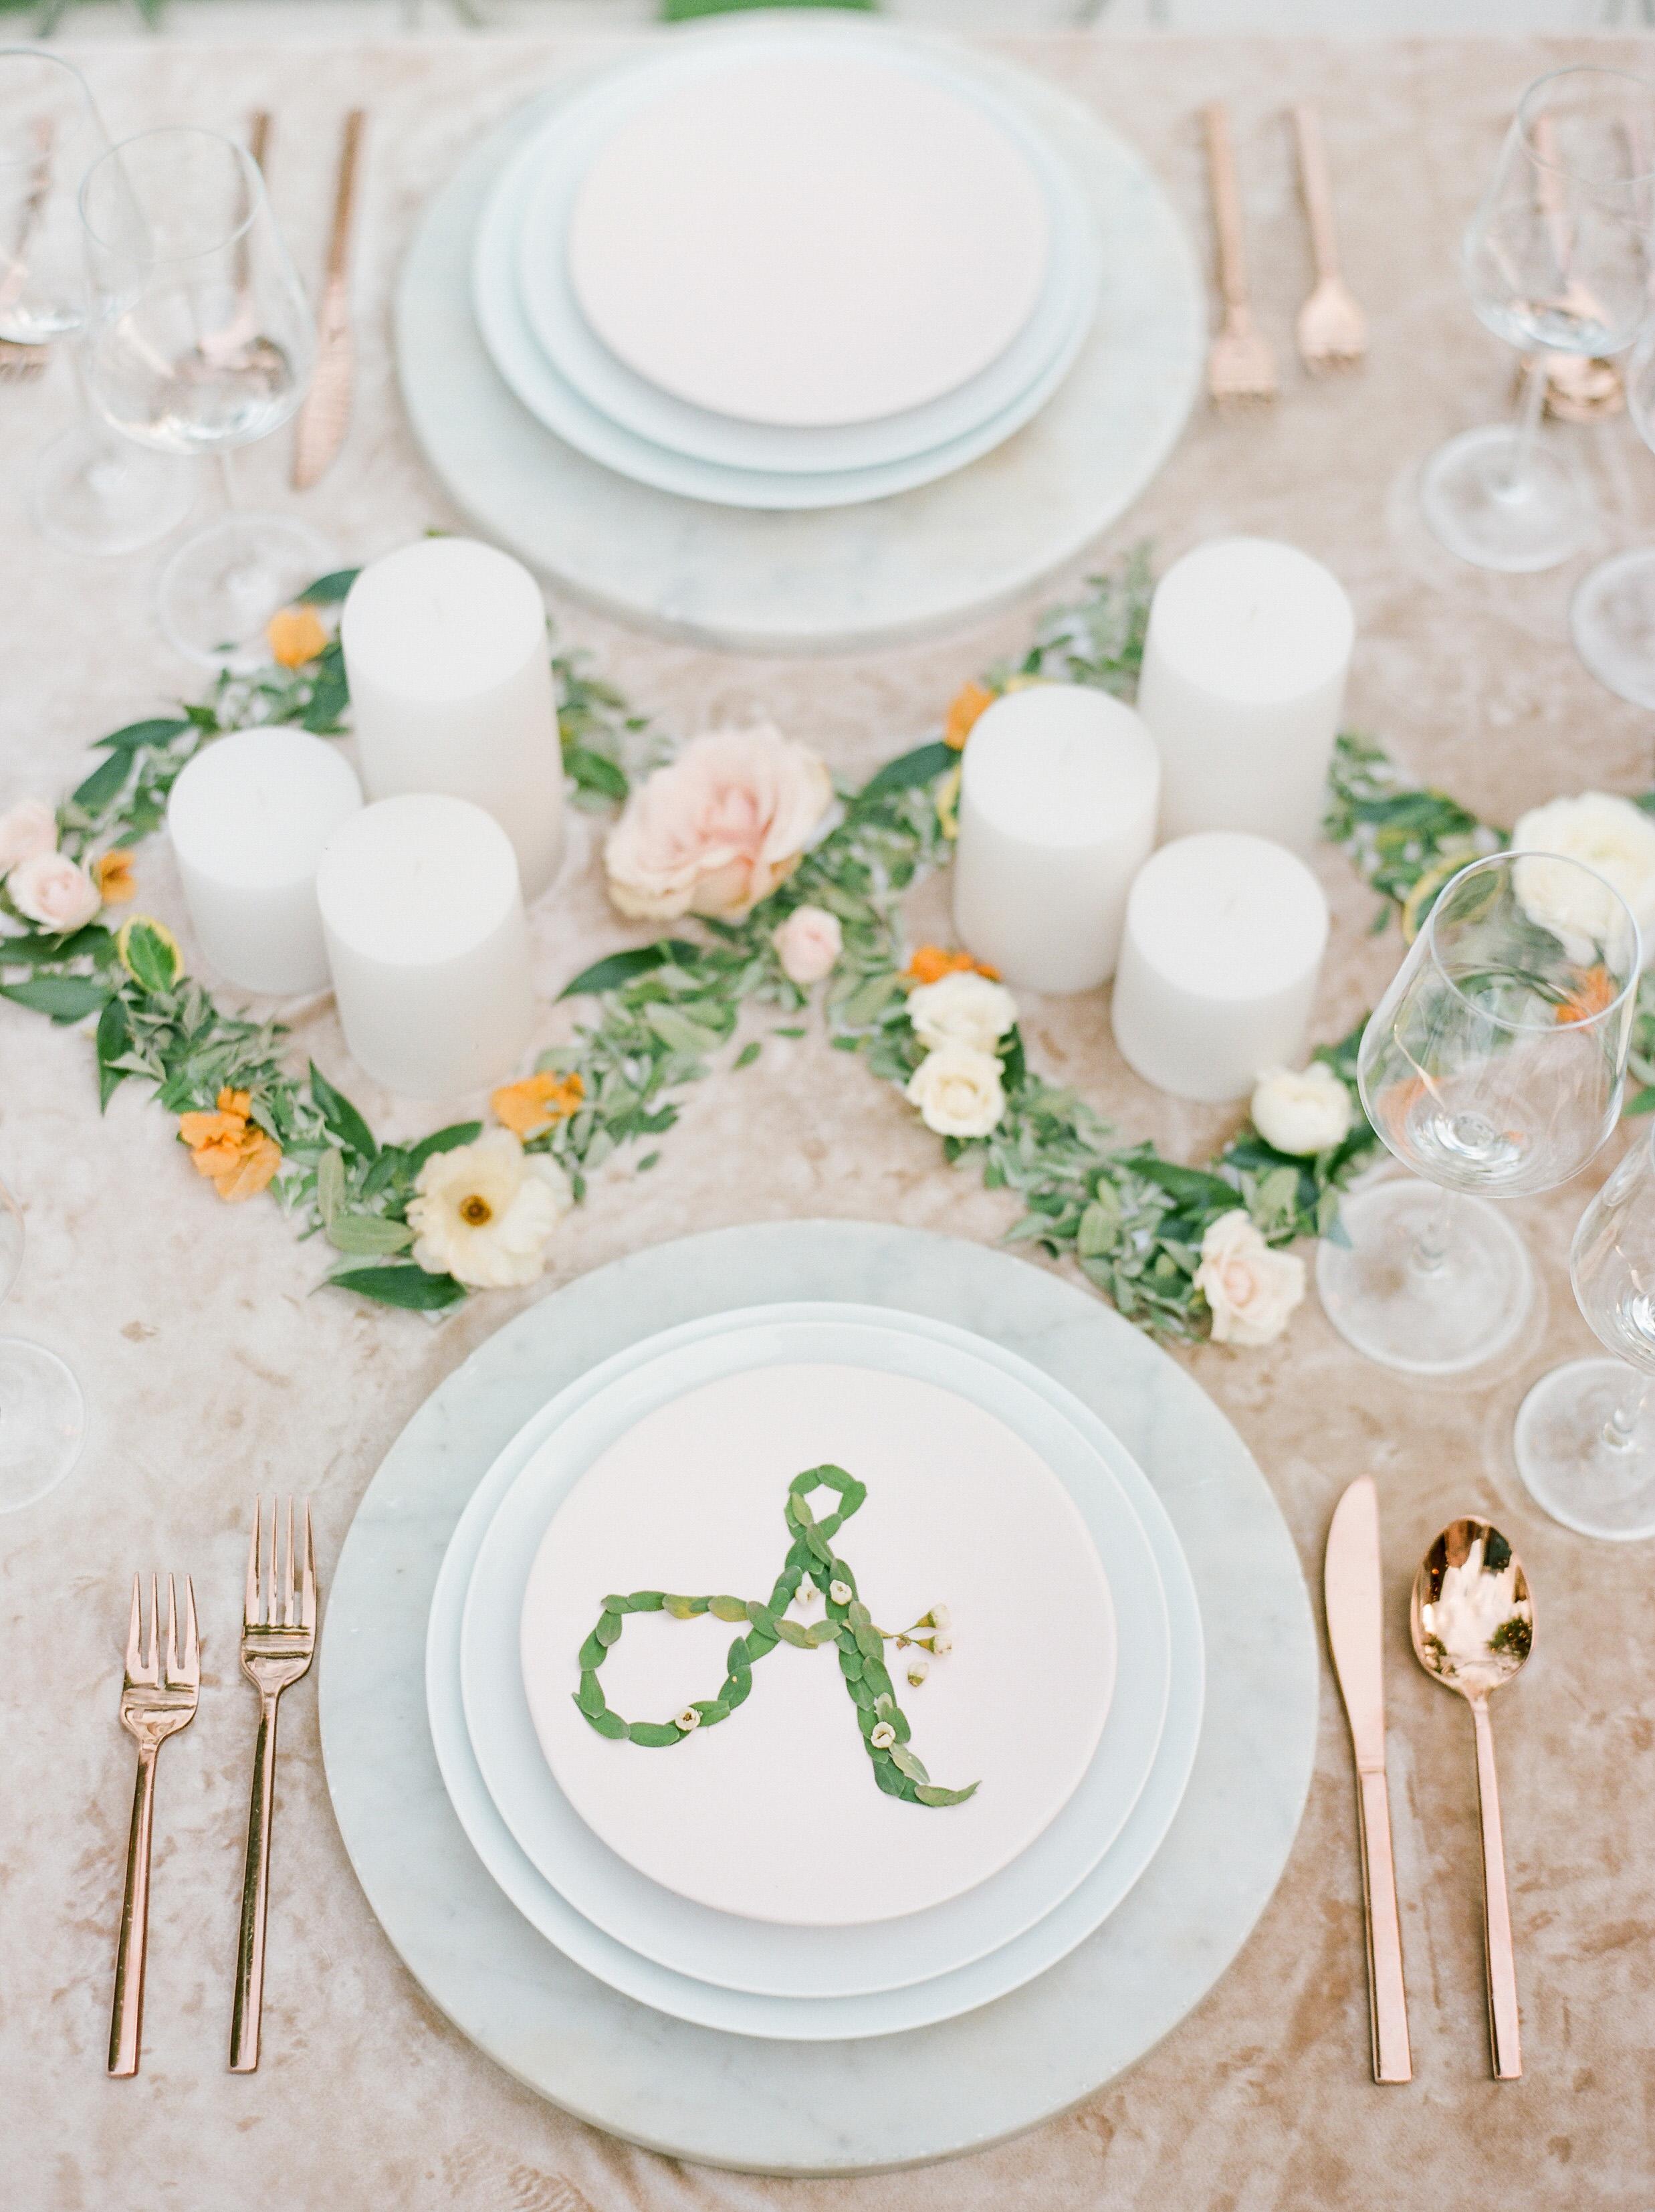 Houston-Wedding-Photographer-Fine-Art-Film-Destination-Style-Me-Pretty-Austin-Dallas-New-Orleans-Dana-Fernandez-Photography-12.jpg